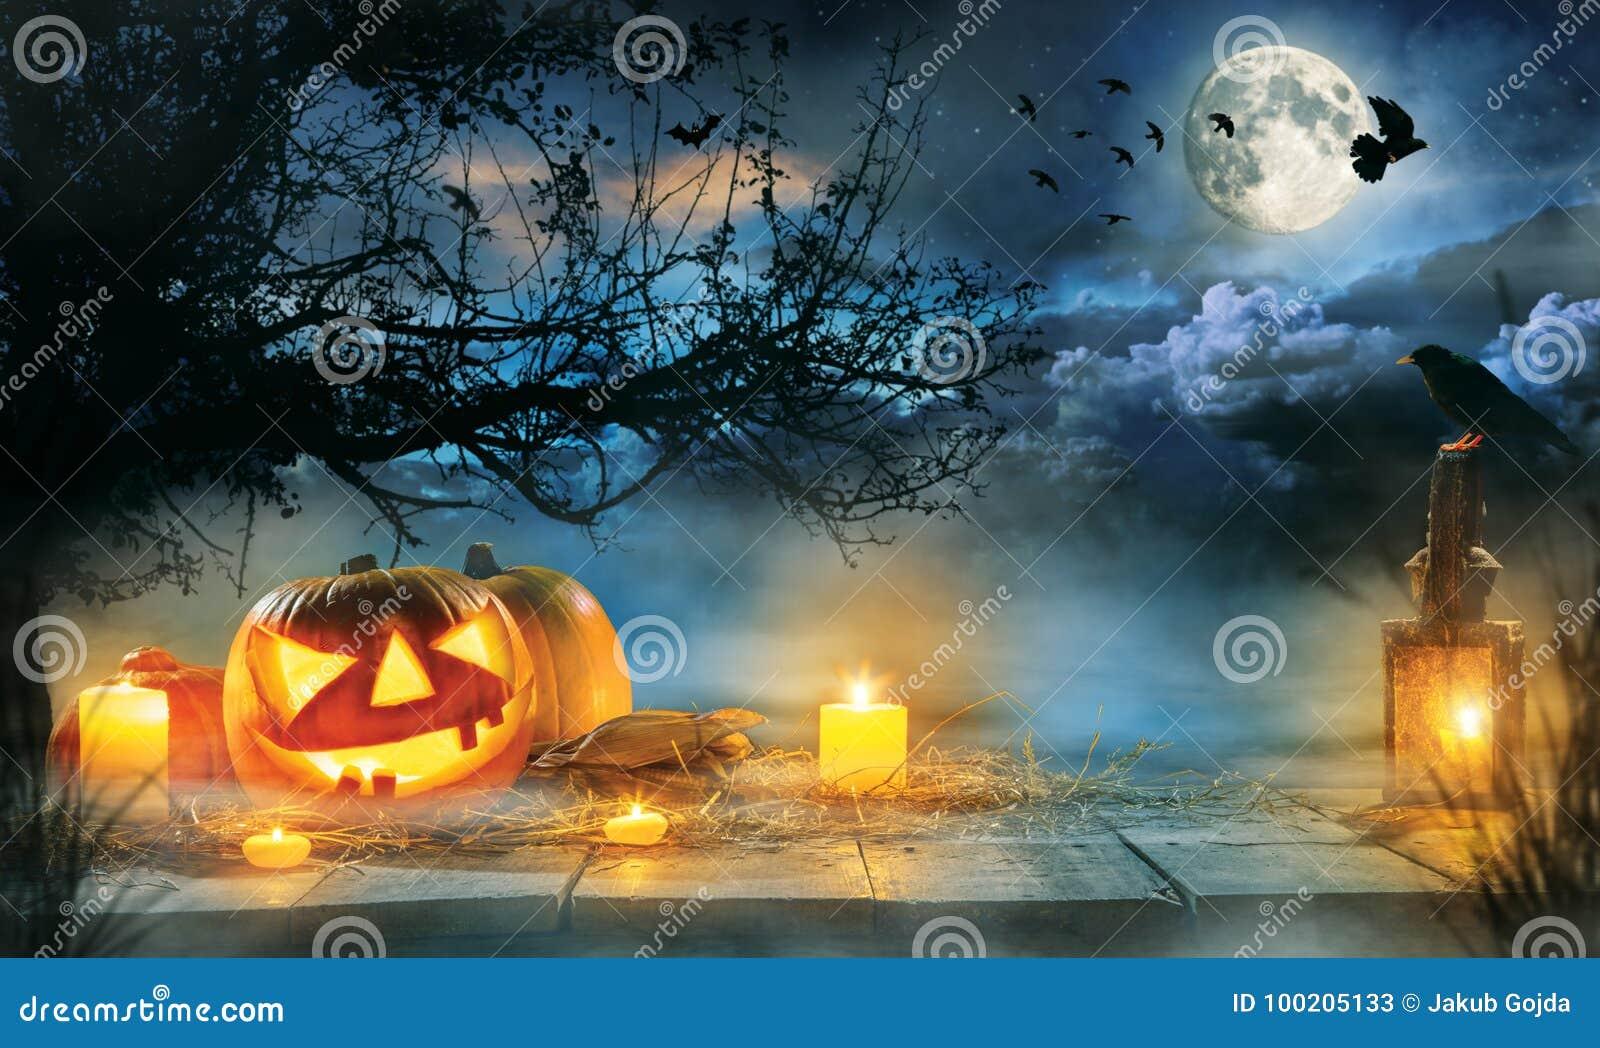 Spooky Halloween Pumpkins On Wooden Planks Stock Photo